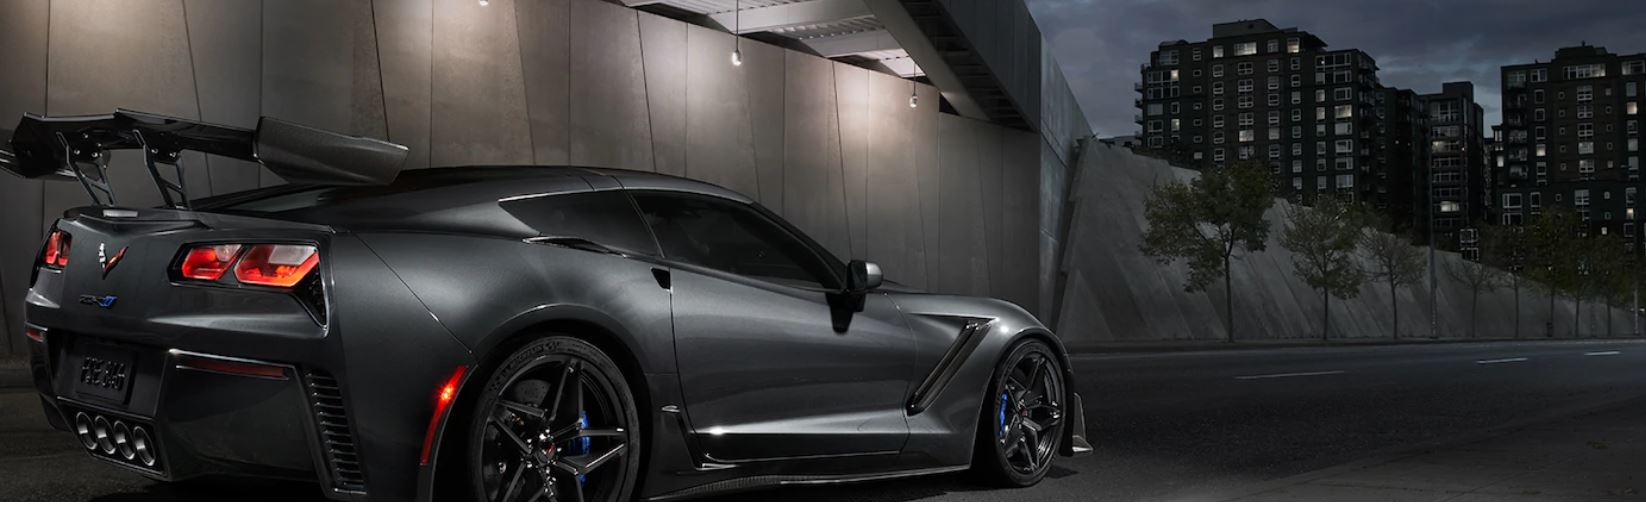 2019 Chevrolet Corvette for Lease near Washington, DC